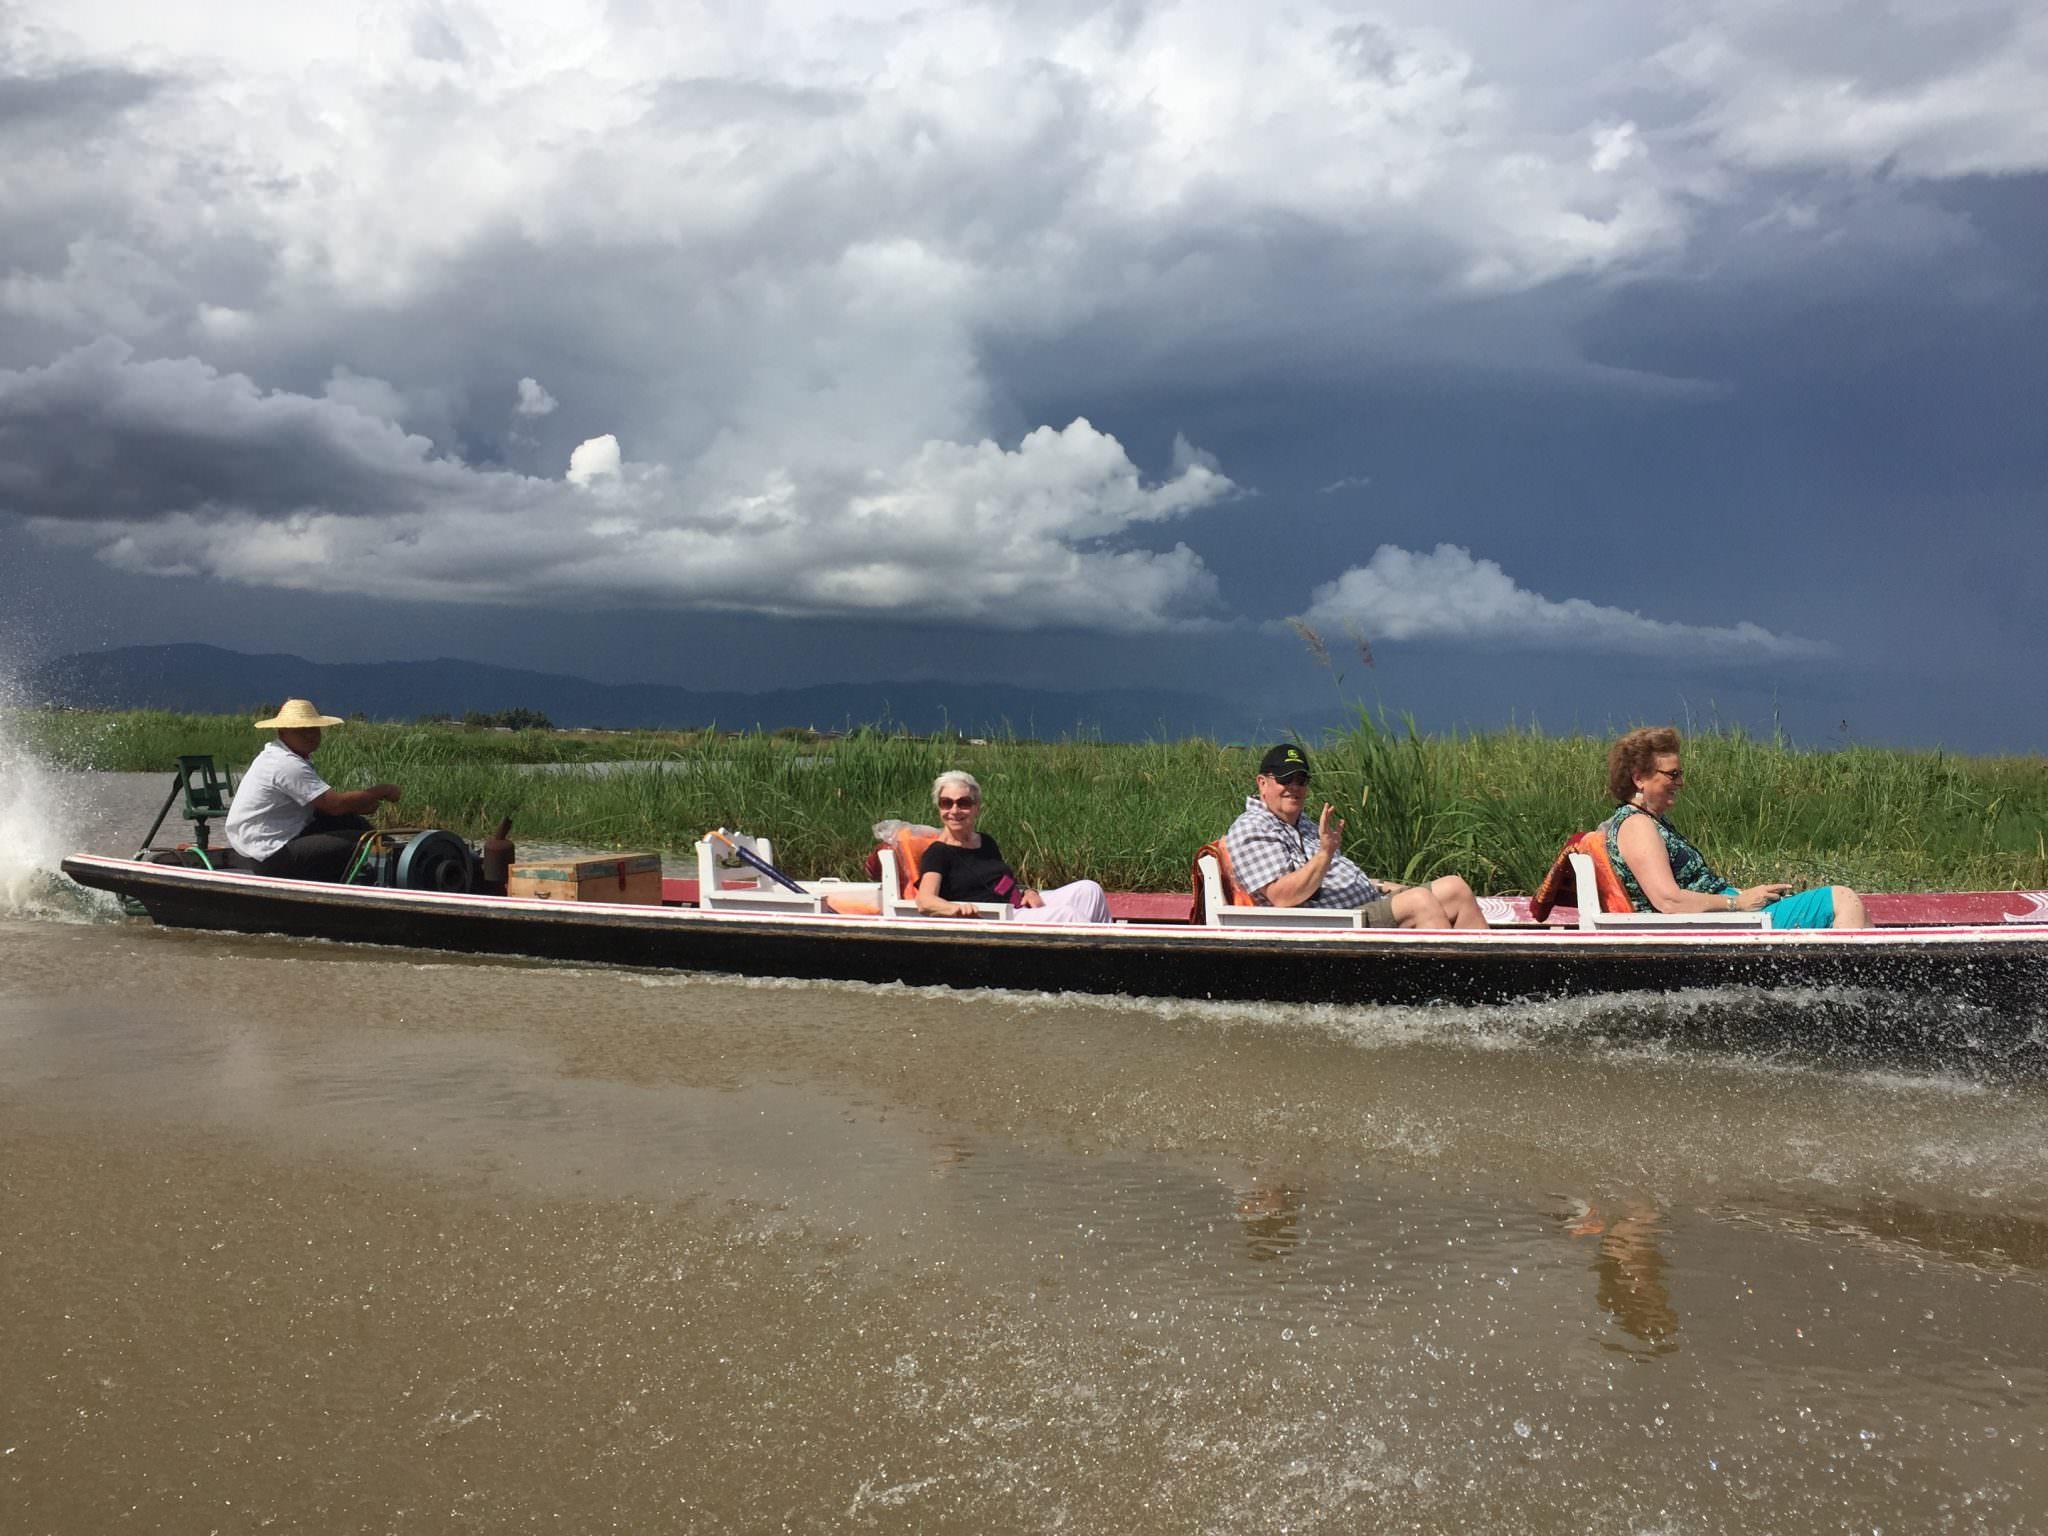 Fellow Viking passengers enjoy the ride around the lake. © 2015 Gail Jessen